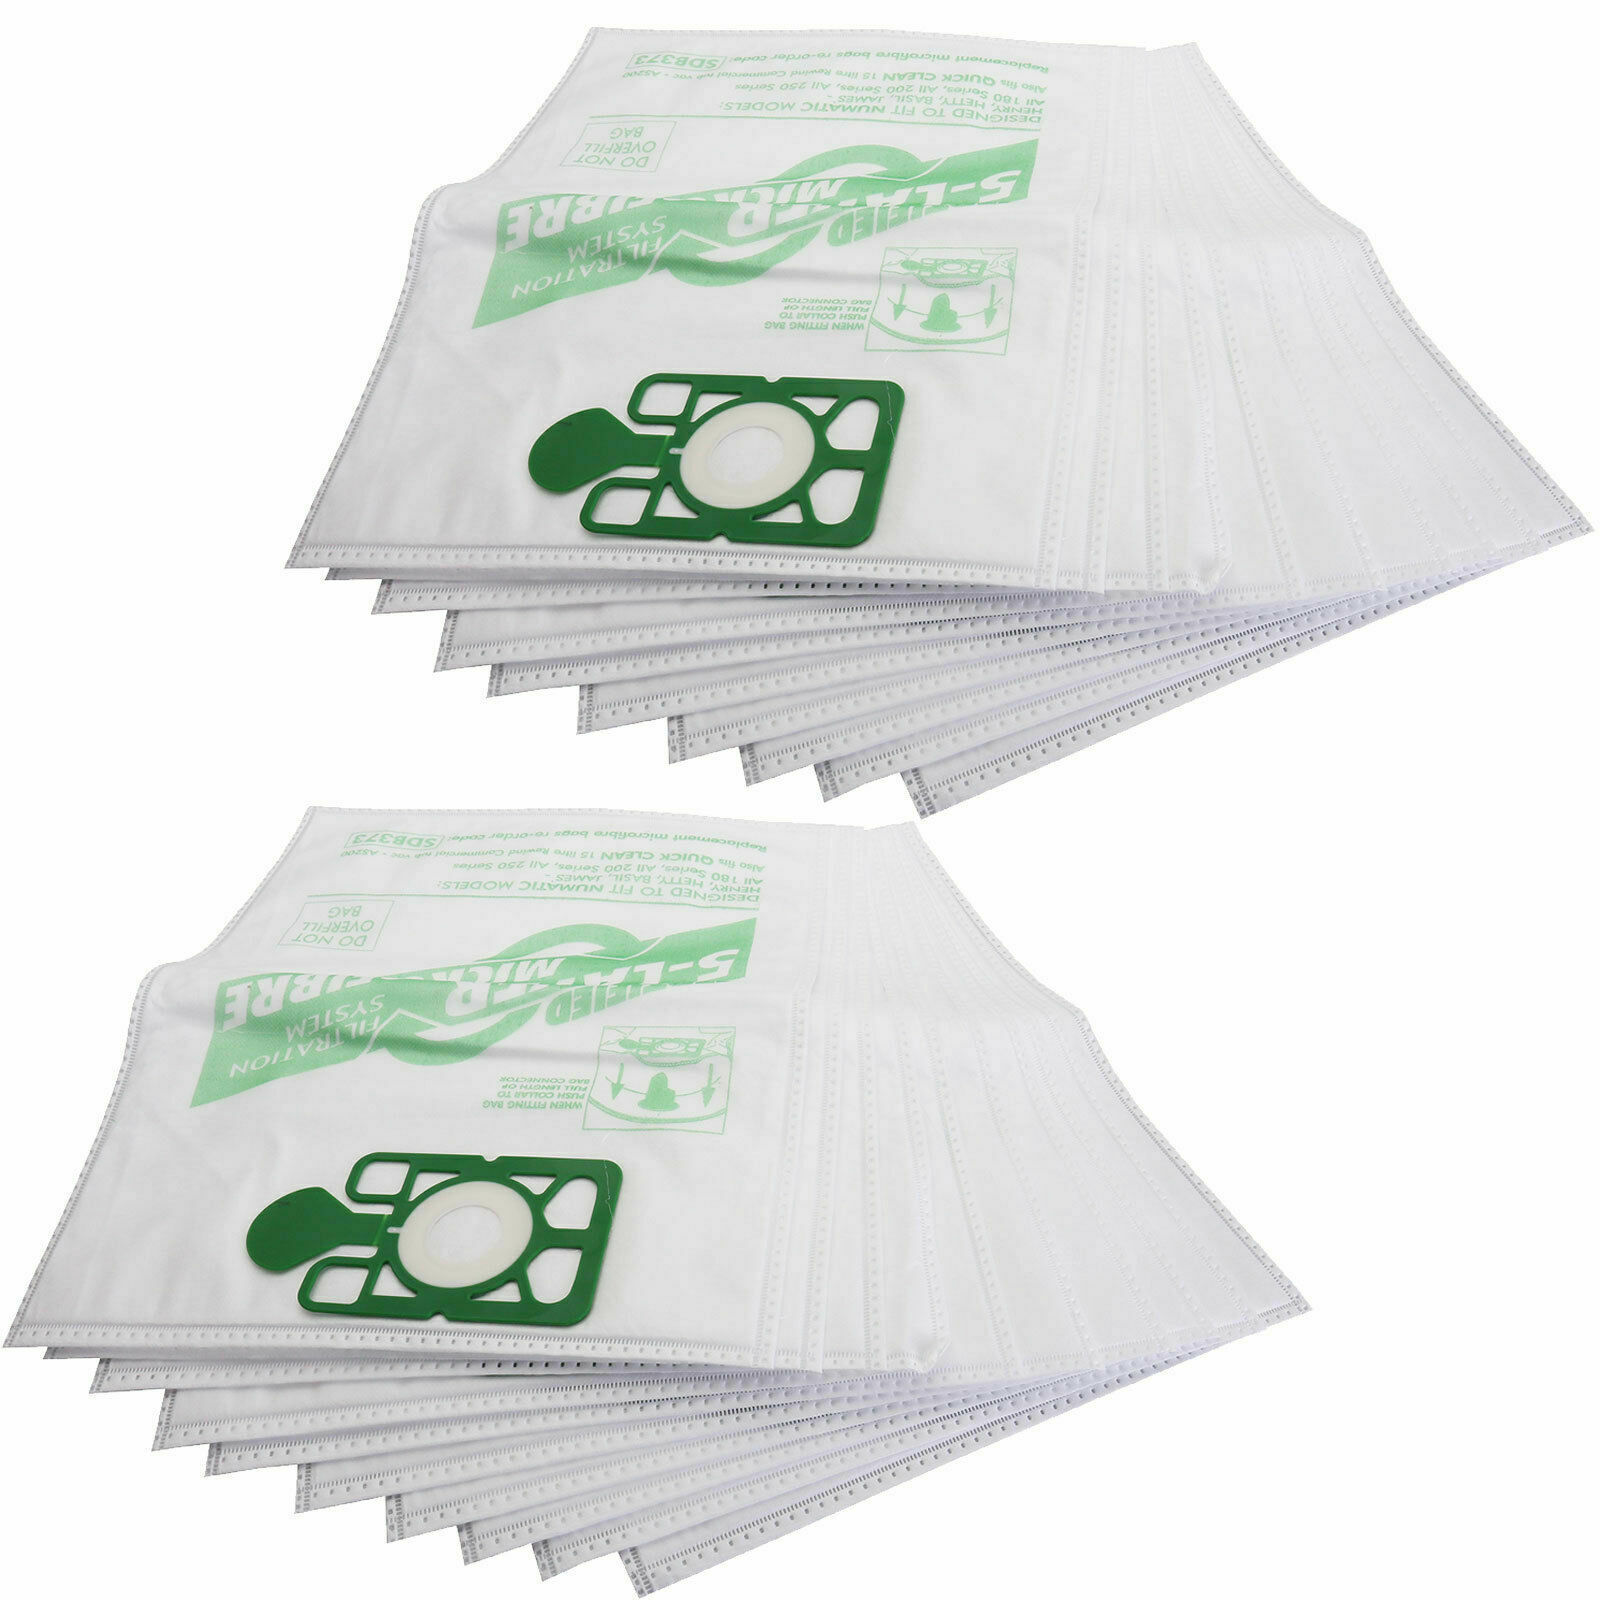 10 X HEPAFLO BAGS FOR NUMATIC HENRY /& HETTY VACUUMS /& AIR FRESHNERS